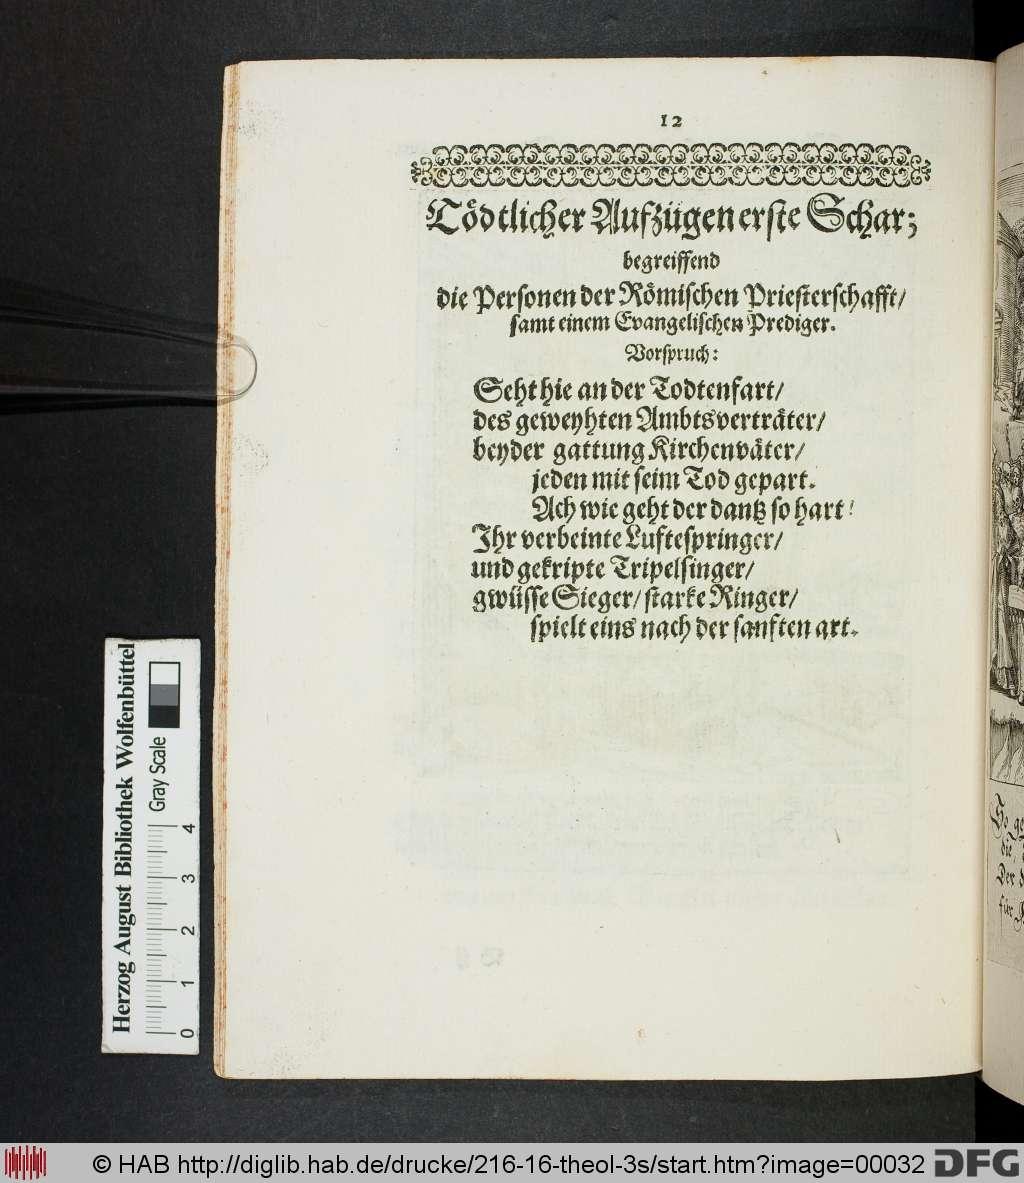 http://diglib.hab.de/drucke/216-16-theol-3s/00032.jpg